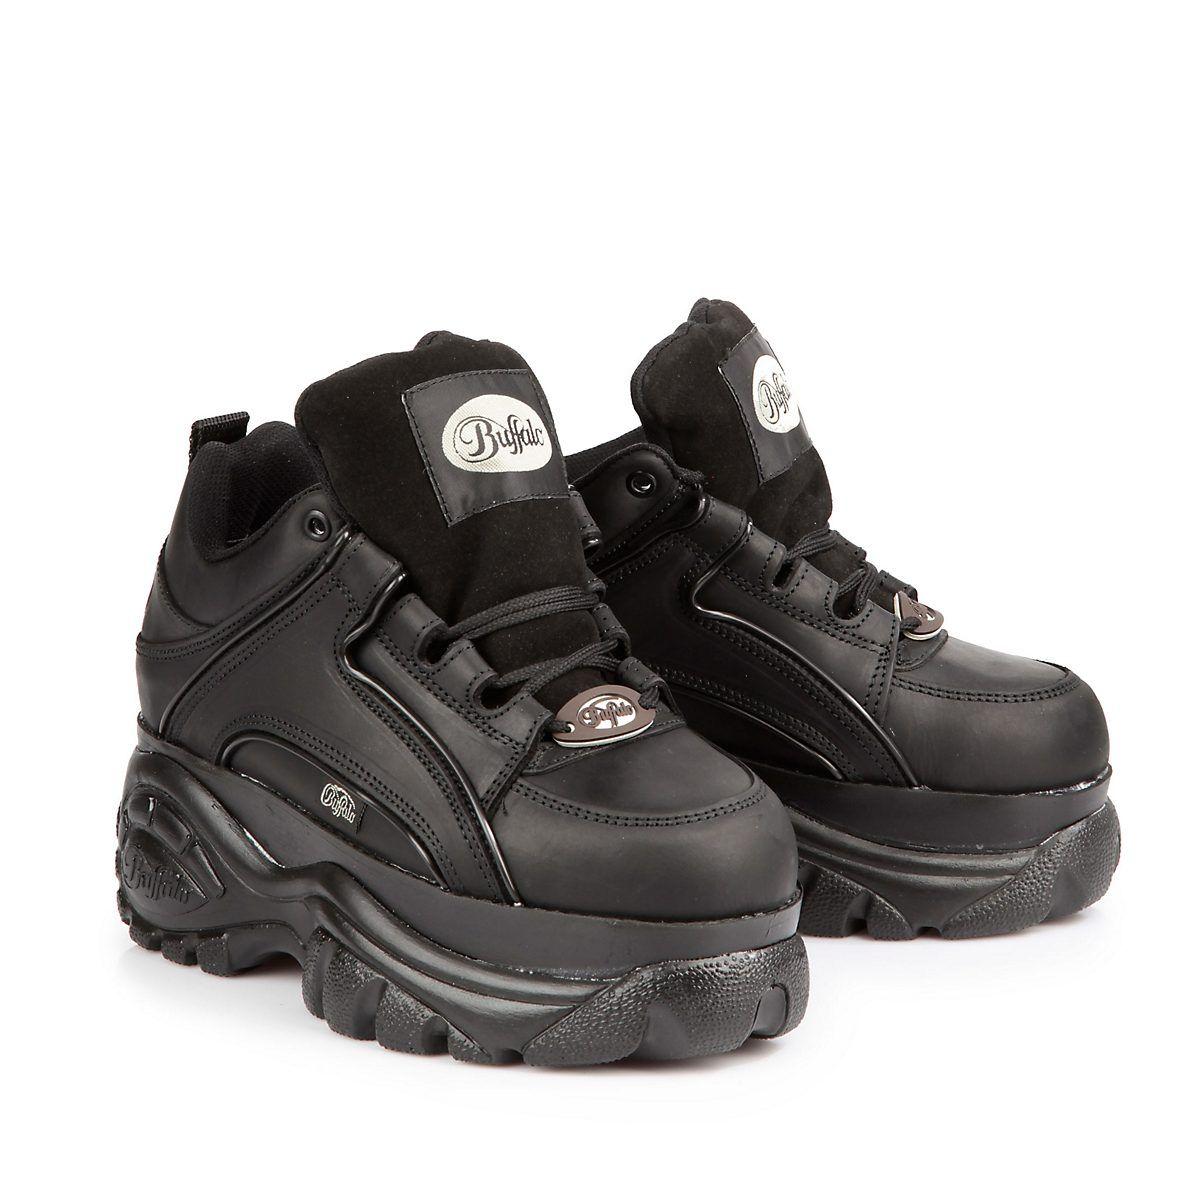 1b99 Virginia Femmes Combat Boots Dr. 1b99 Virginie Femmes Bottes De Combat Dr. Martens Martens 6QchtN5